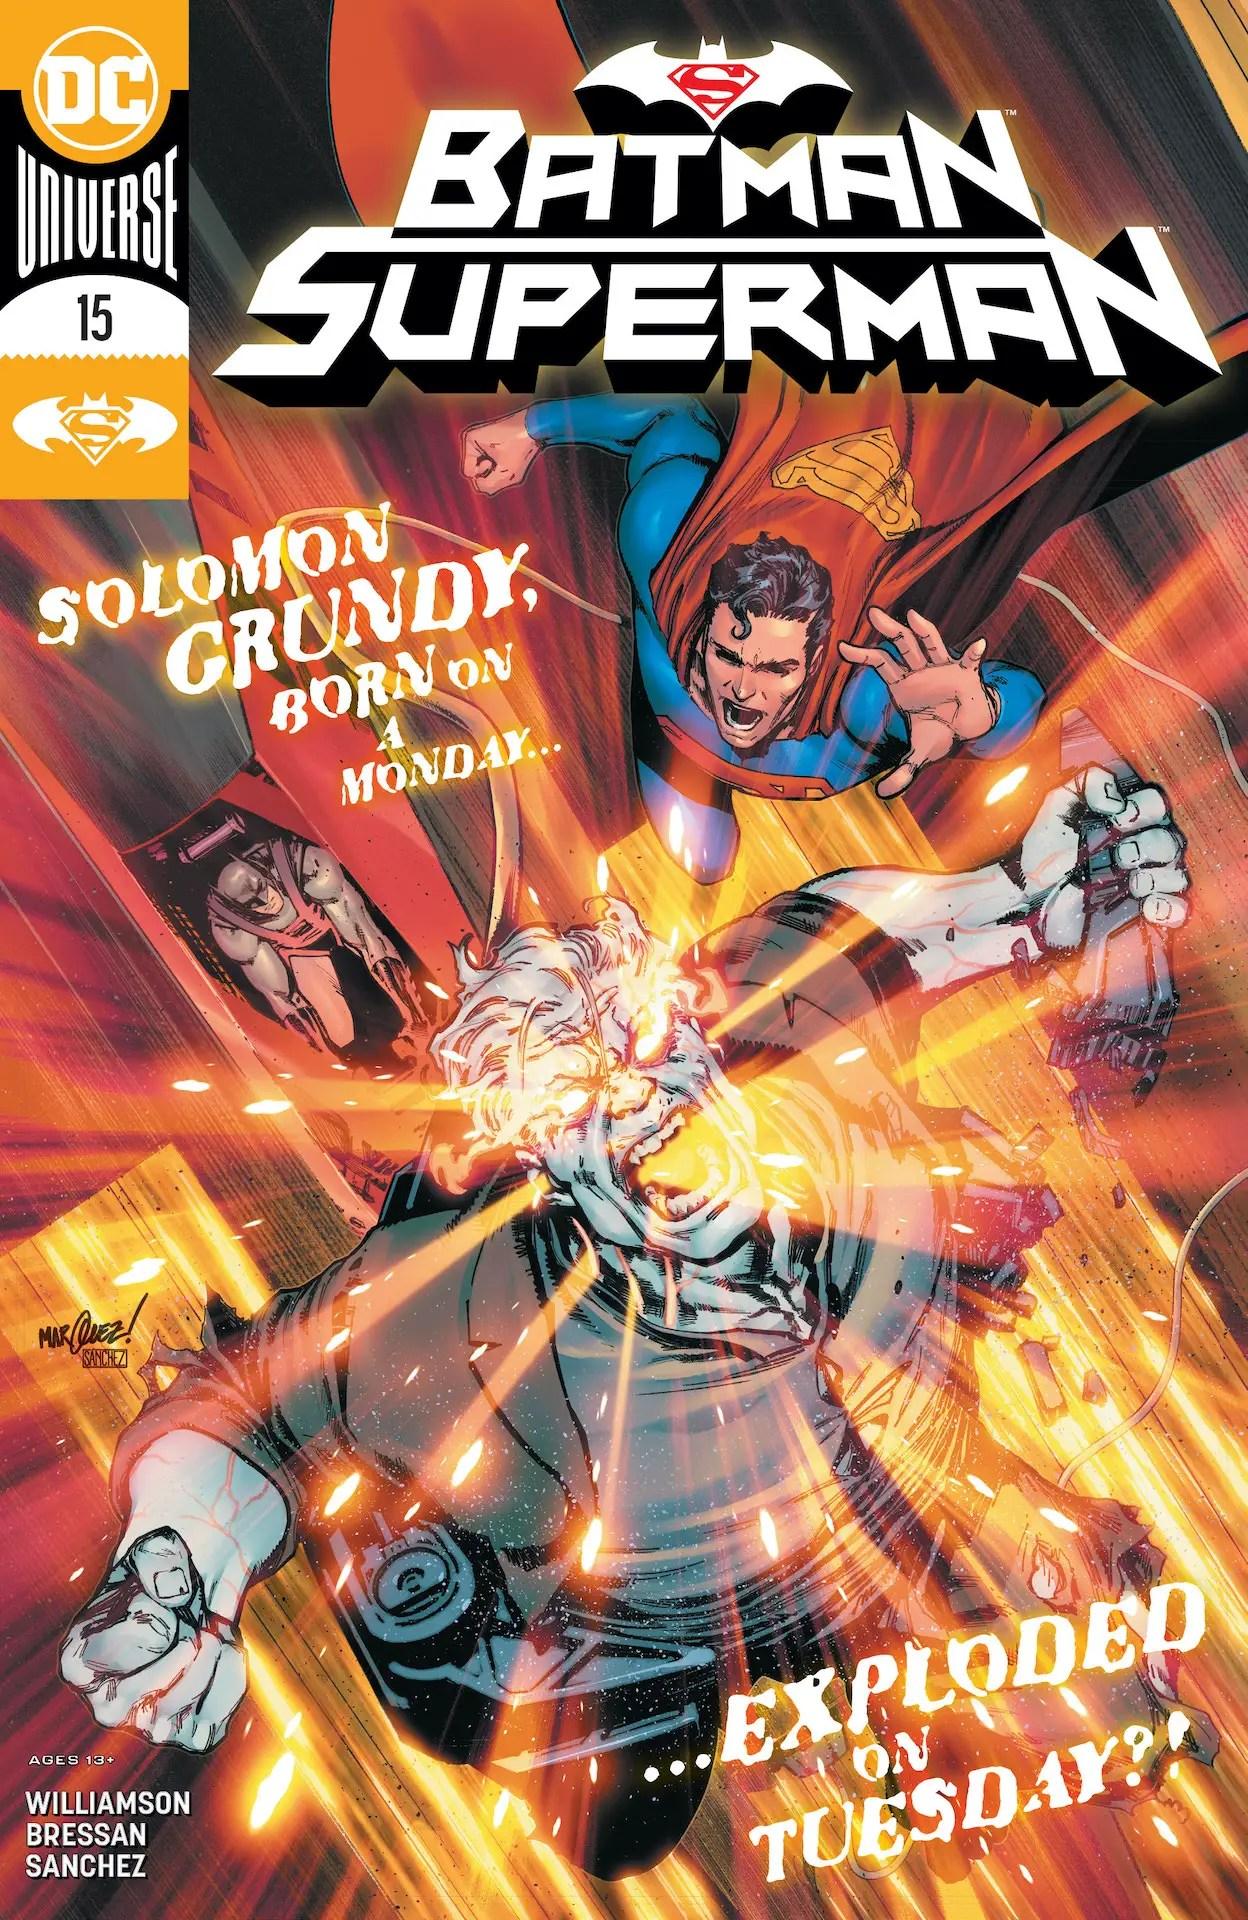 'Batman/Superman' #15 review